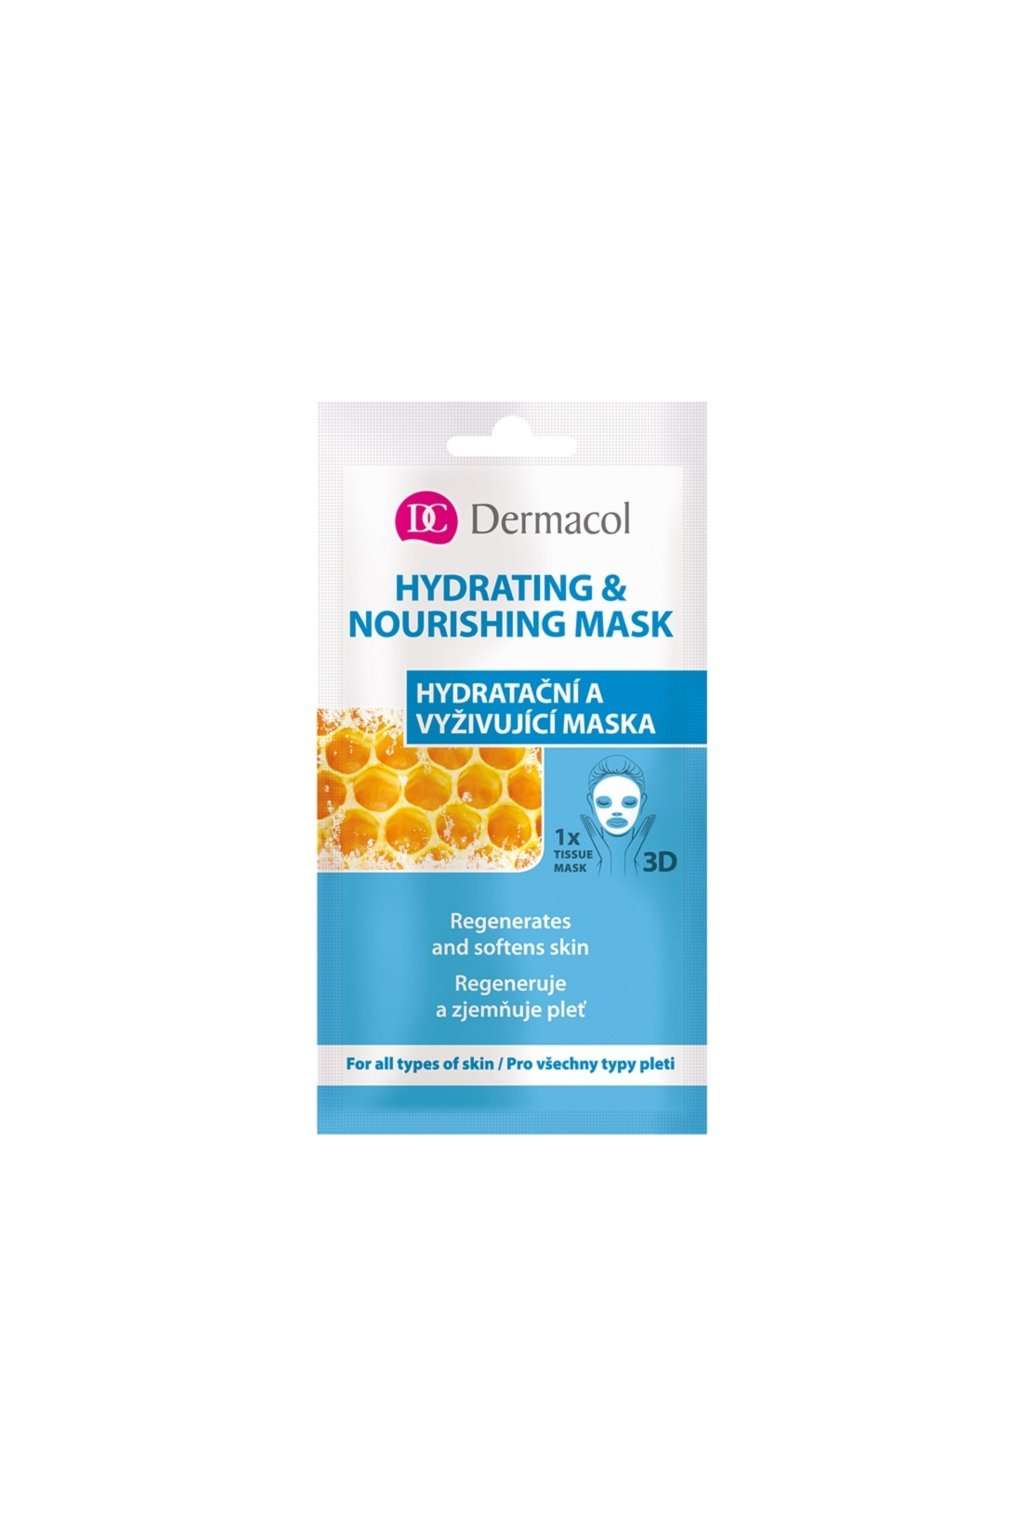 dermacol hydrating nourishing mask textilni 3d hydratacni a vyzivujici maska 15